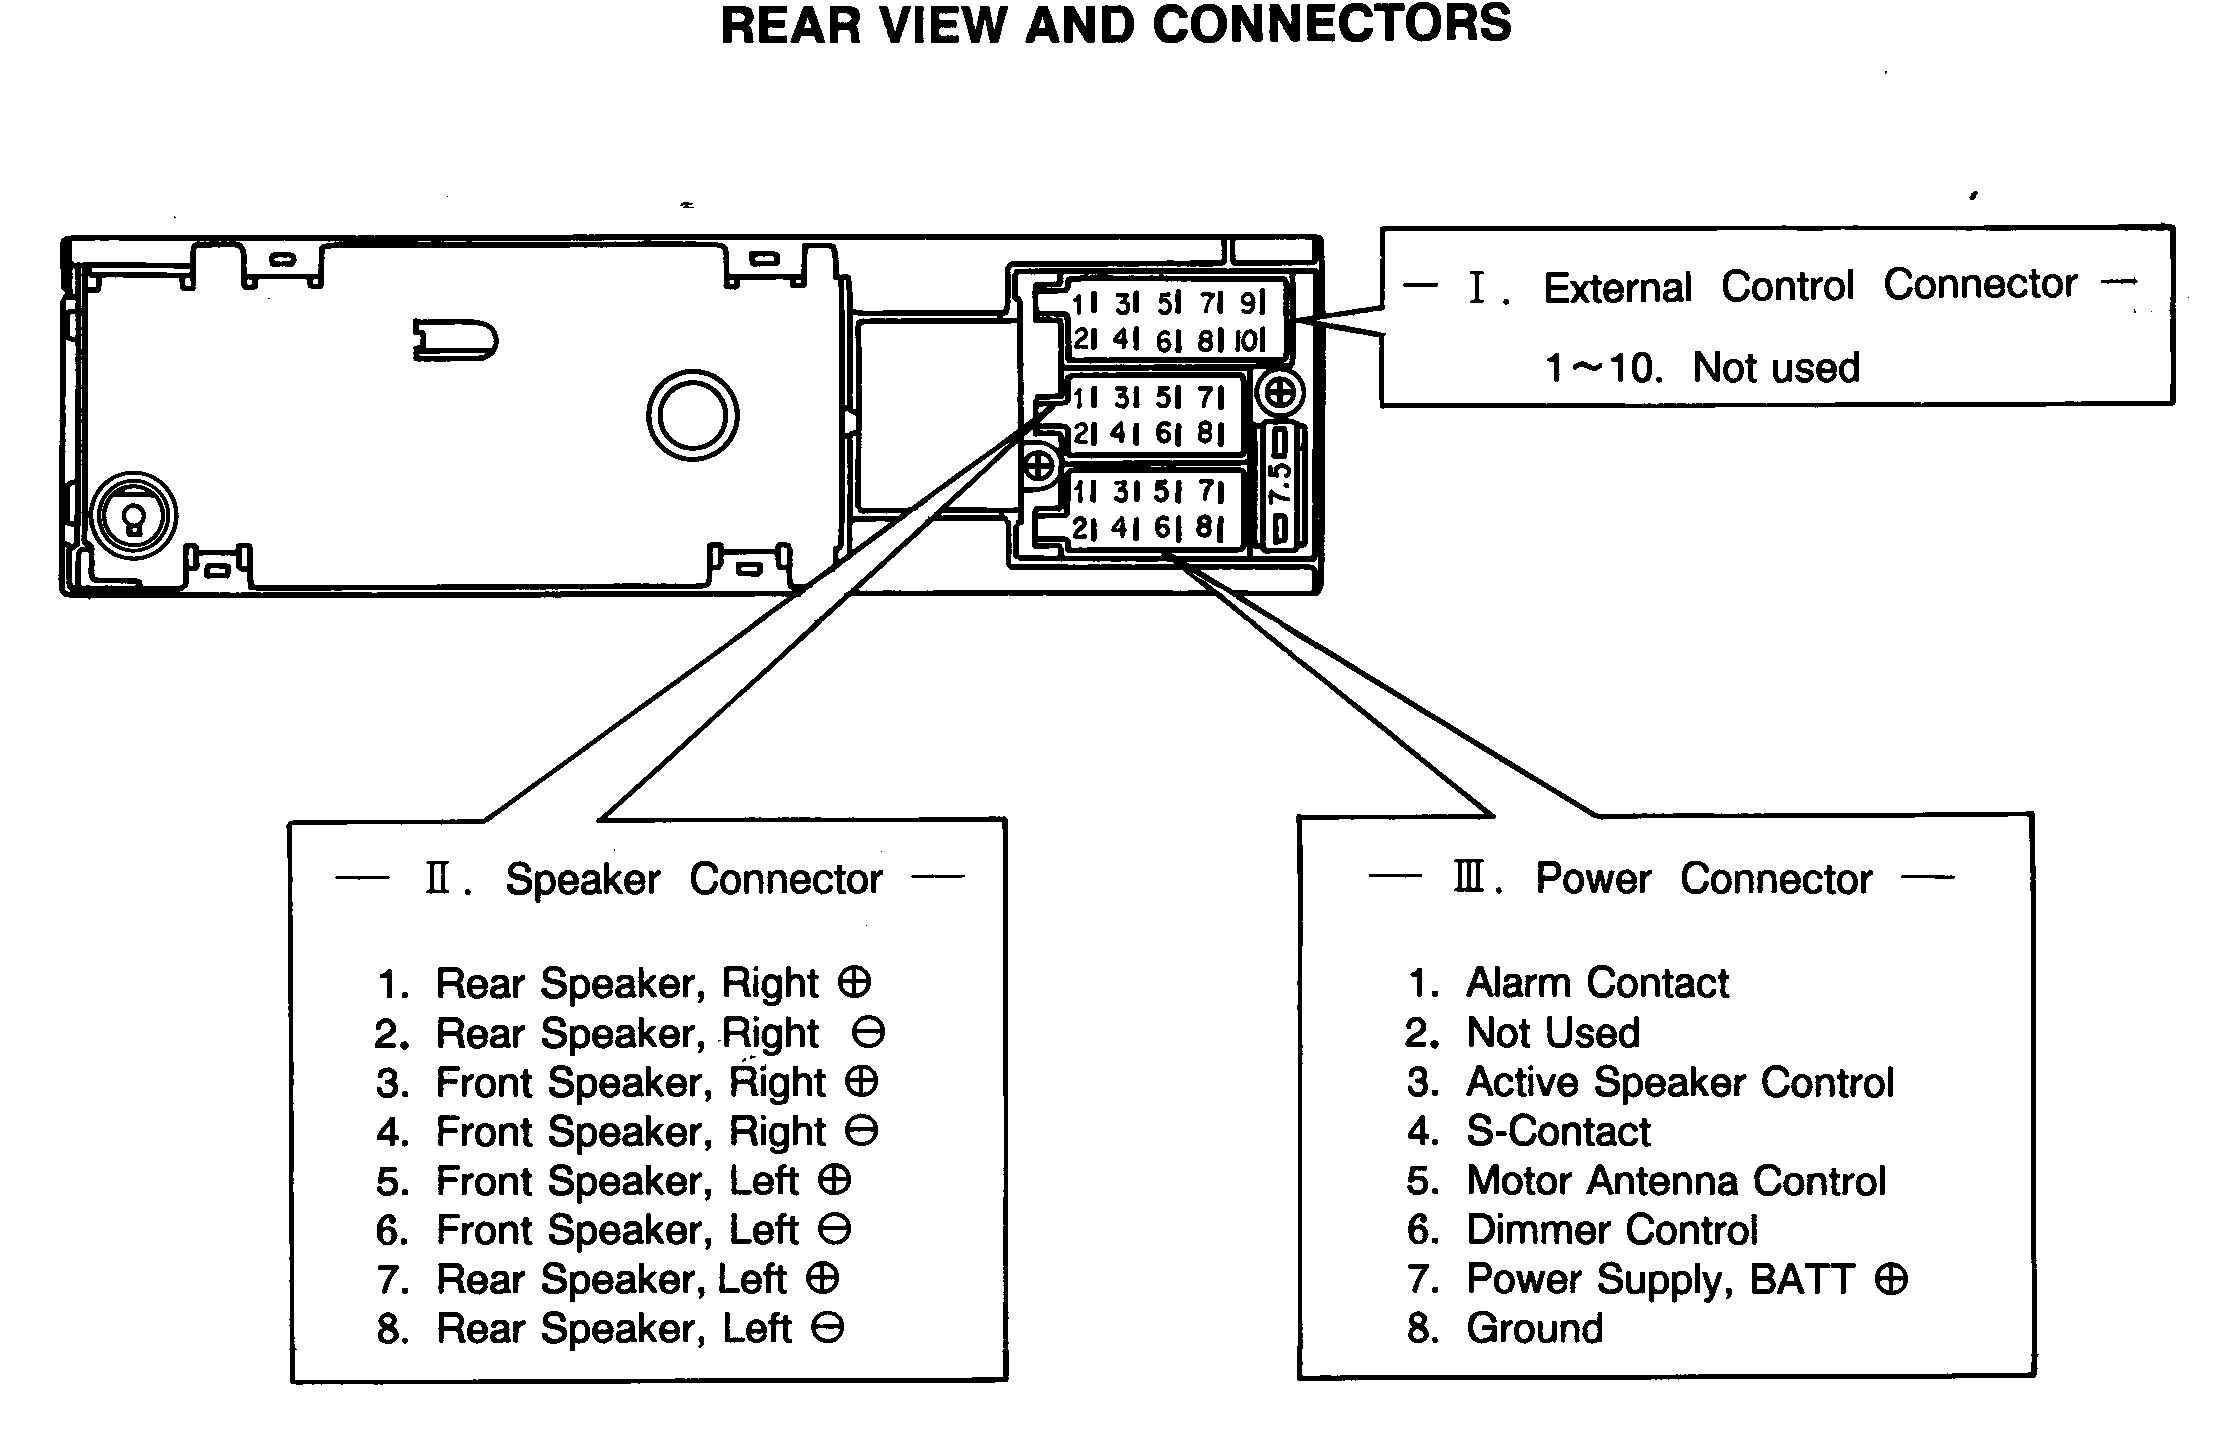 bmw car speakers wiring diagram enthusiast wiring diagrams u2022 rh rasalibre co pioneer car speaker wiring diagram car speaker wiring diagram crutchfield